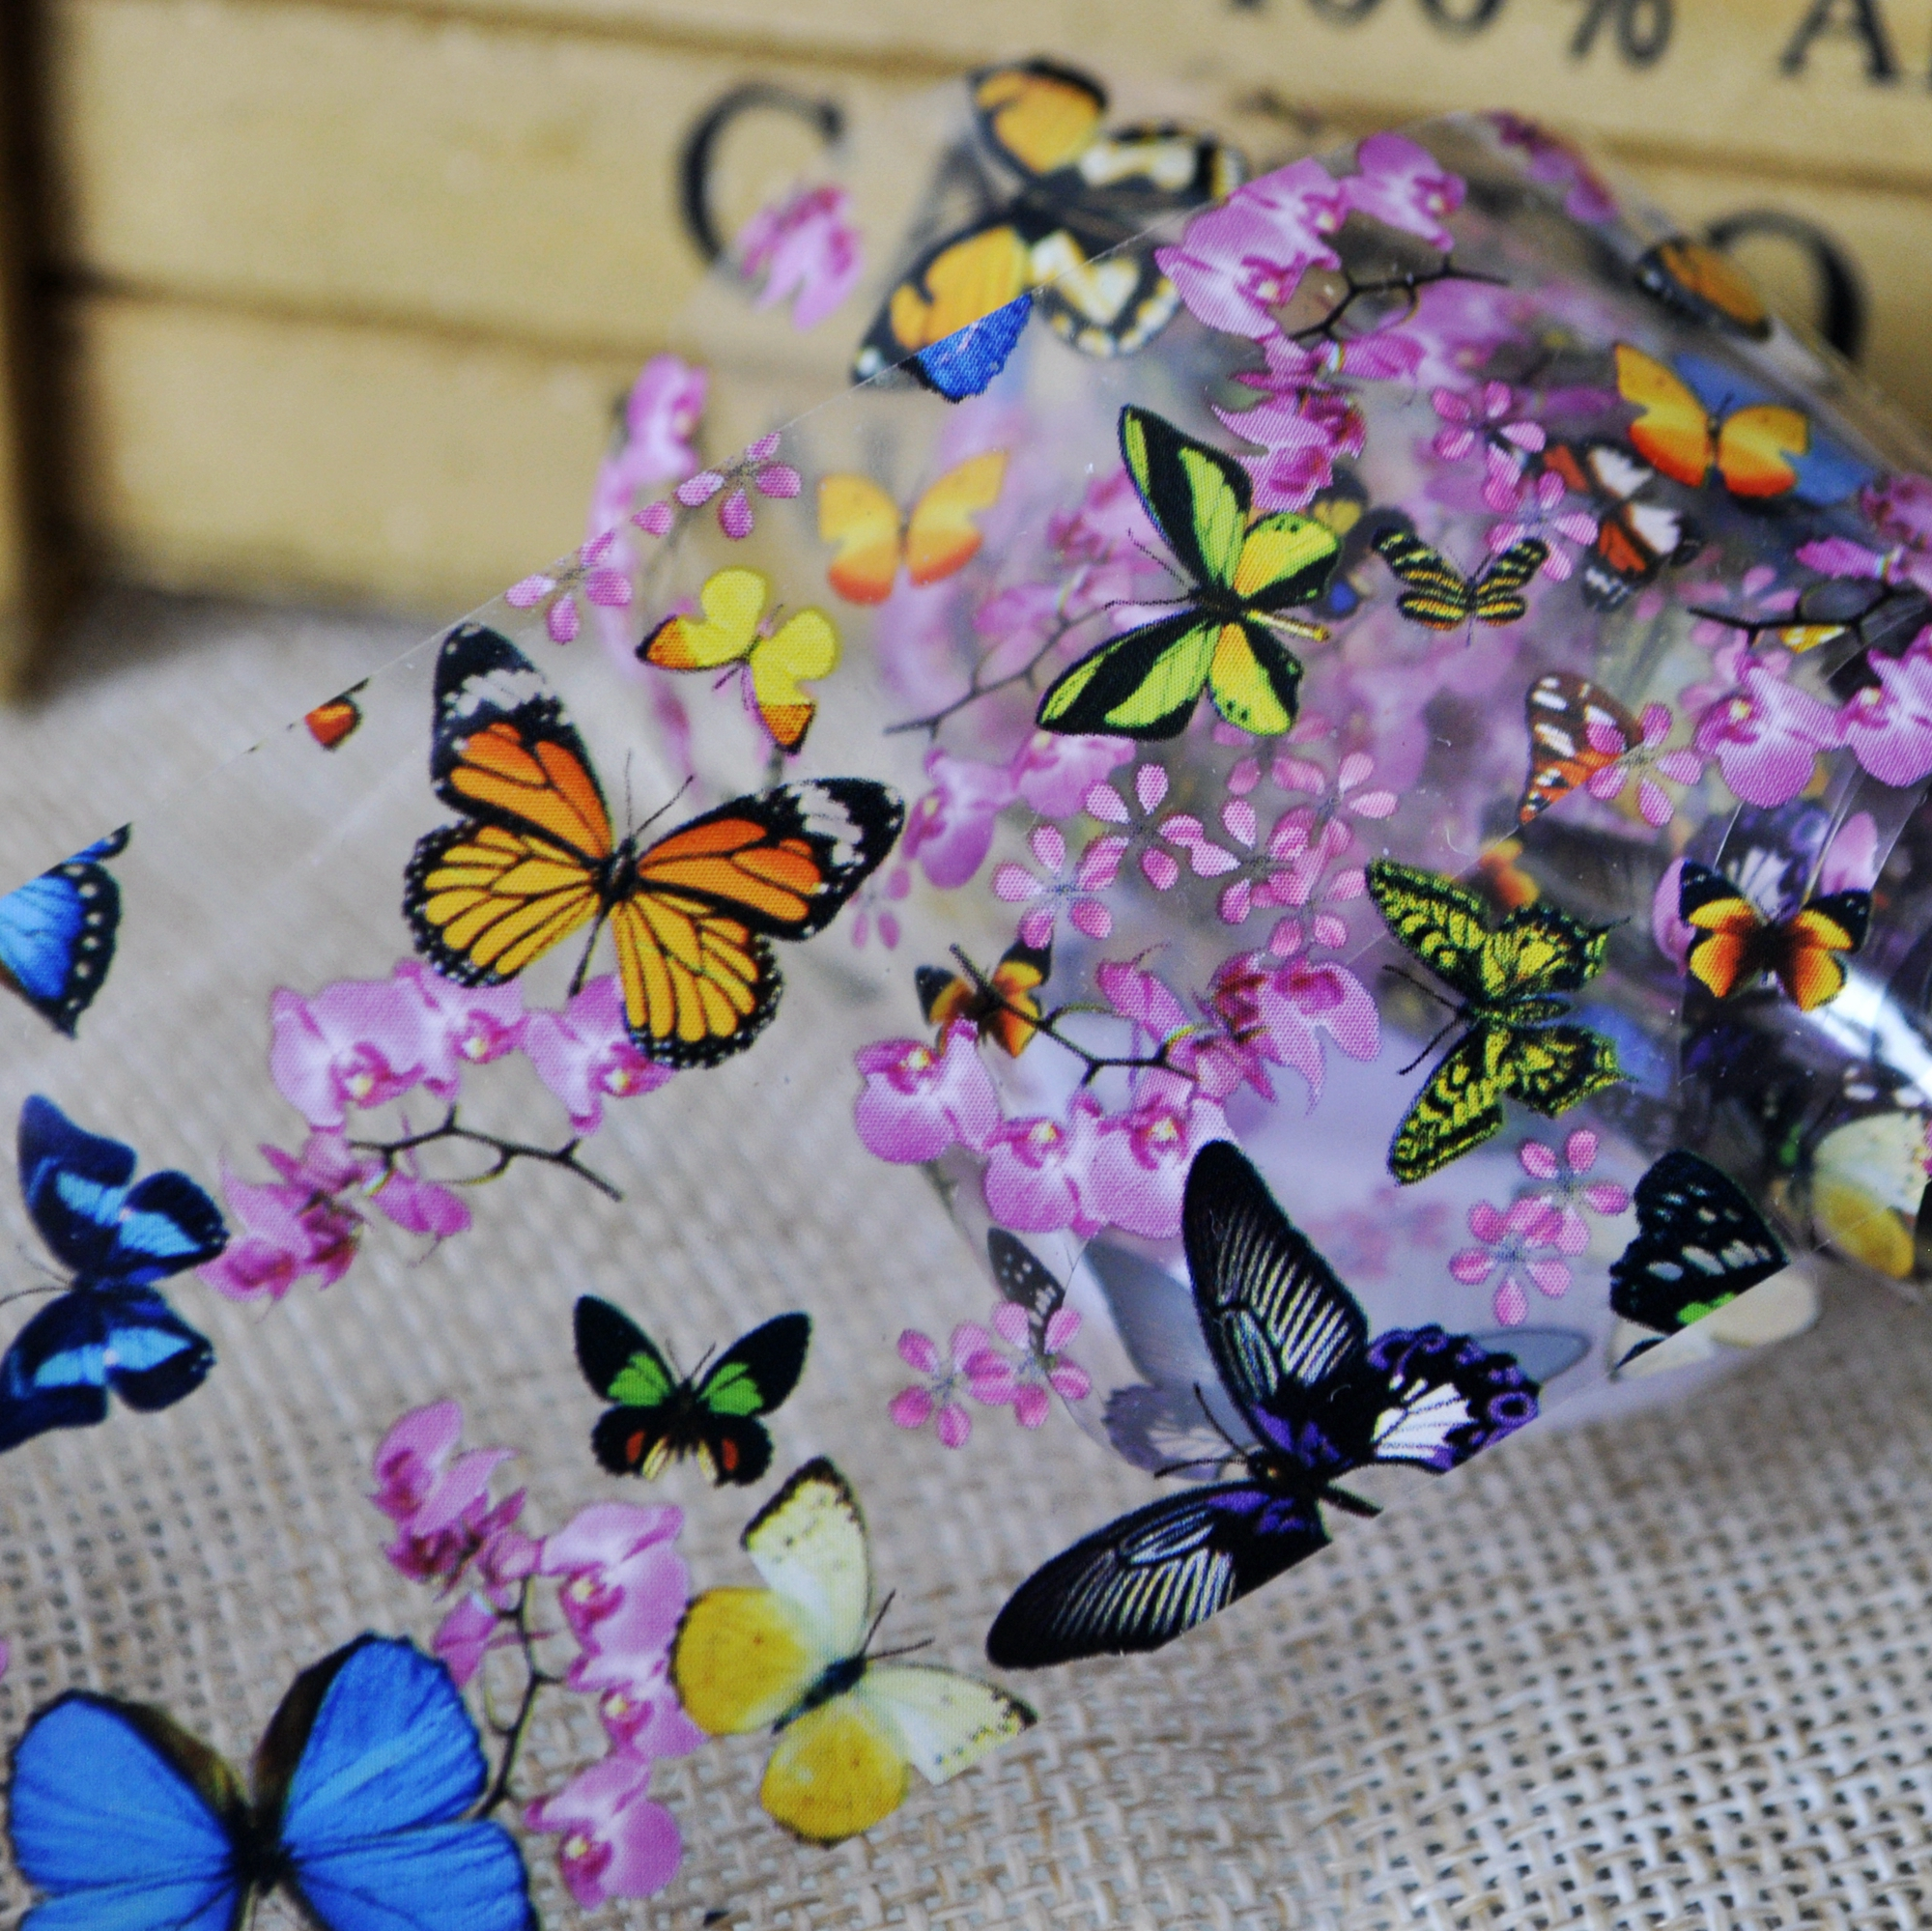 Lady Nail Folies Multicolor Vlinders Patroon Transfer Film Polish - Nagel kunst